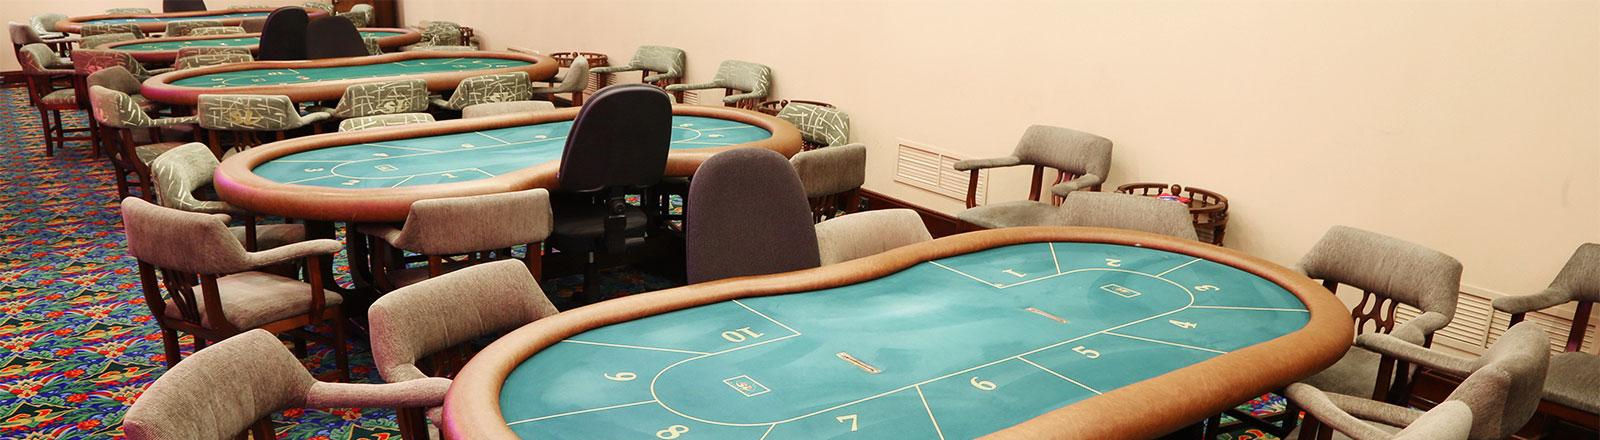 spartan slots casino askgamblers review